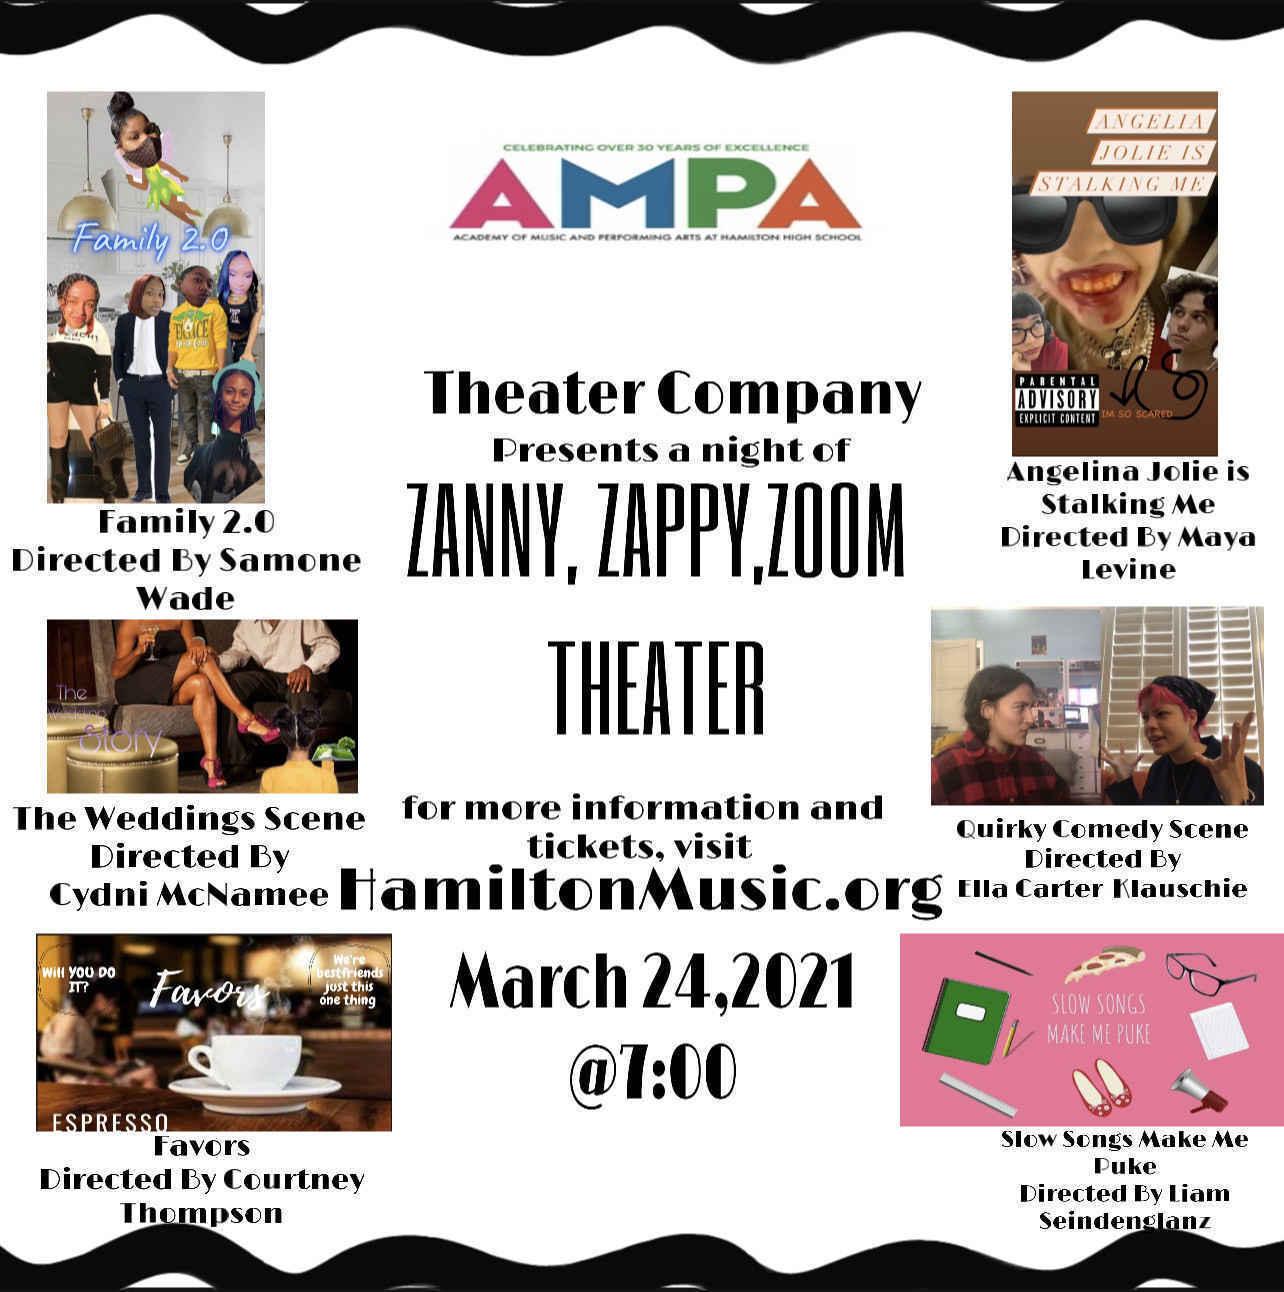 Zanny, Zappy, Zoom Theater image